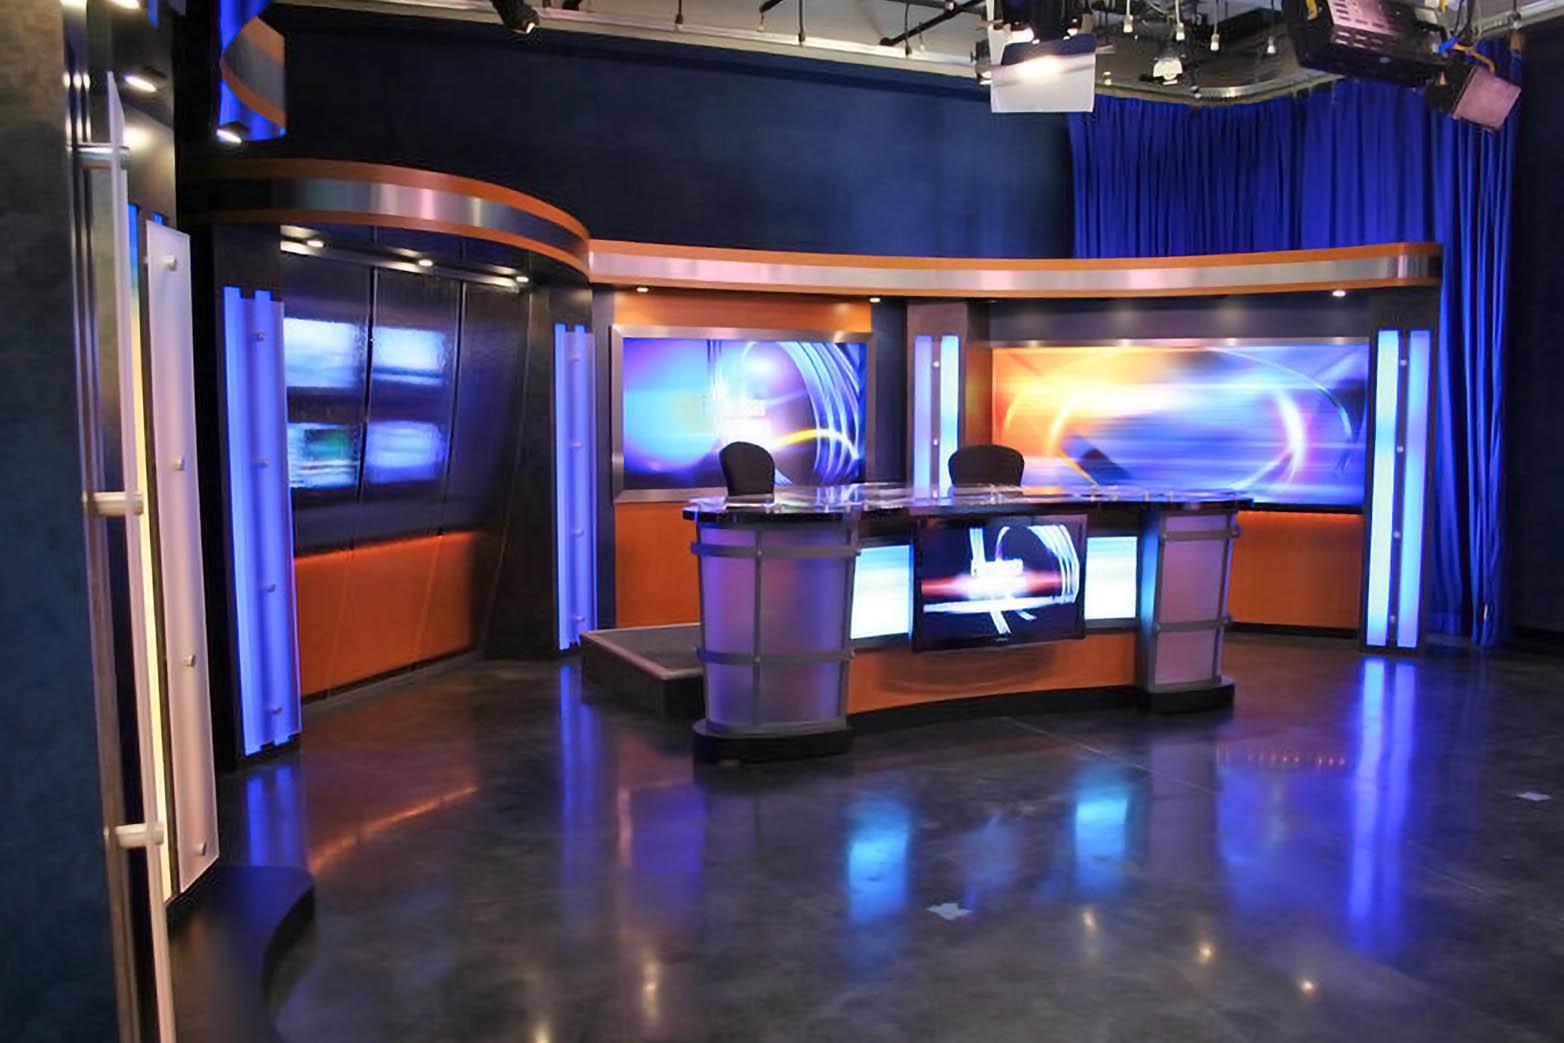 KBAK TV studio